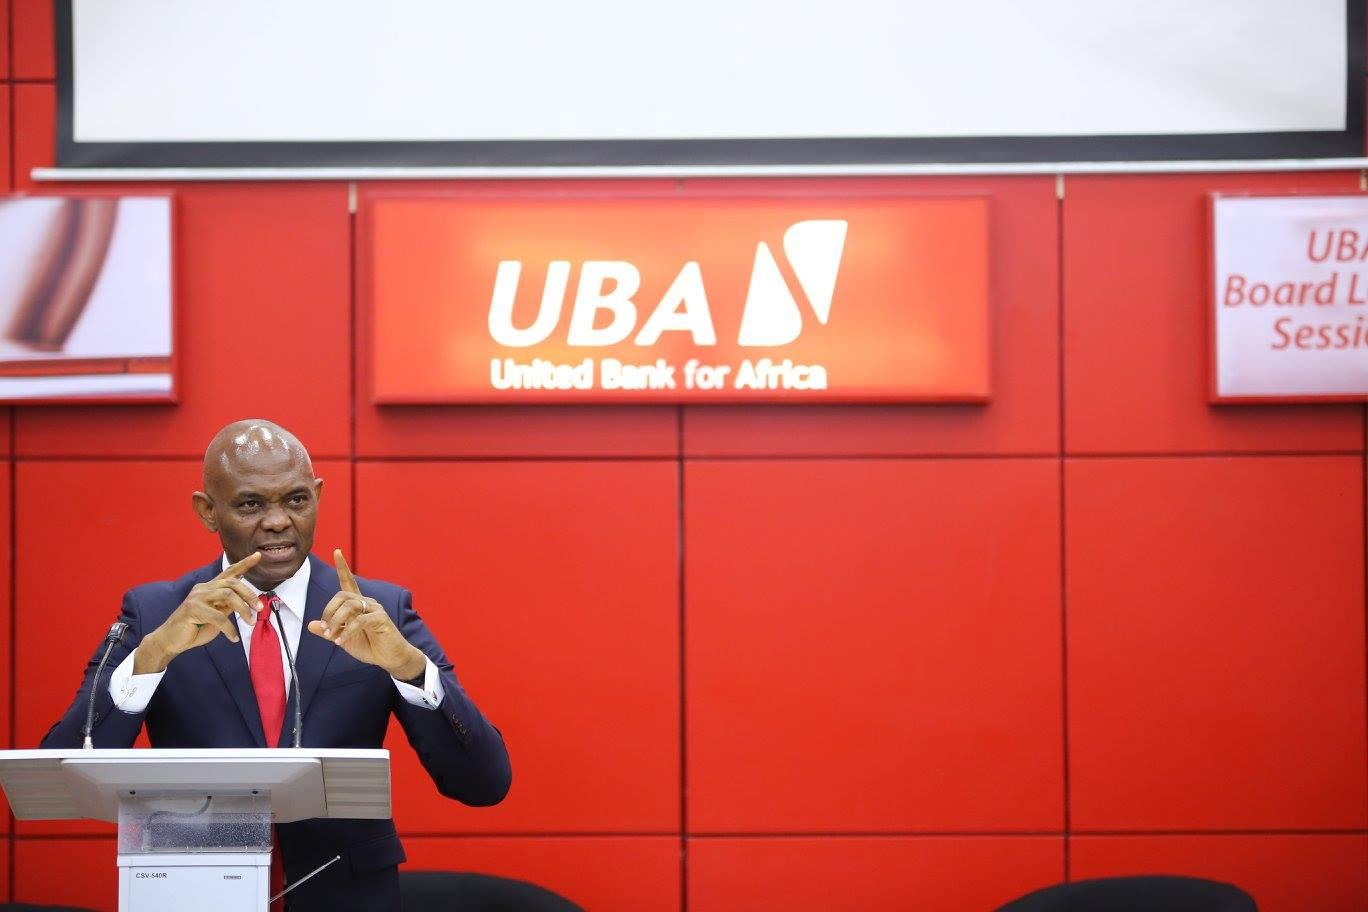 UBA Bank Online Money Transfer | Download UBA Mobile App Here